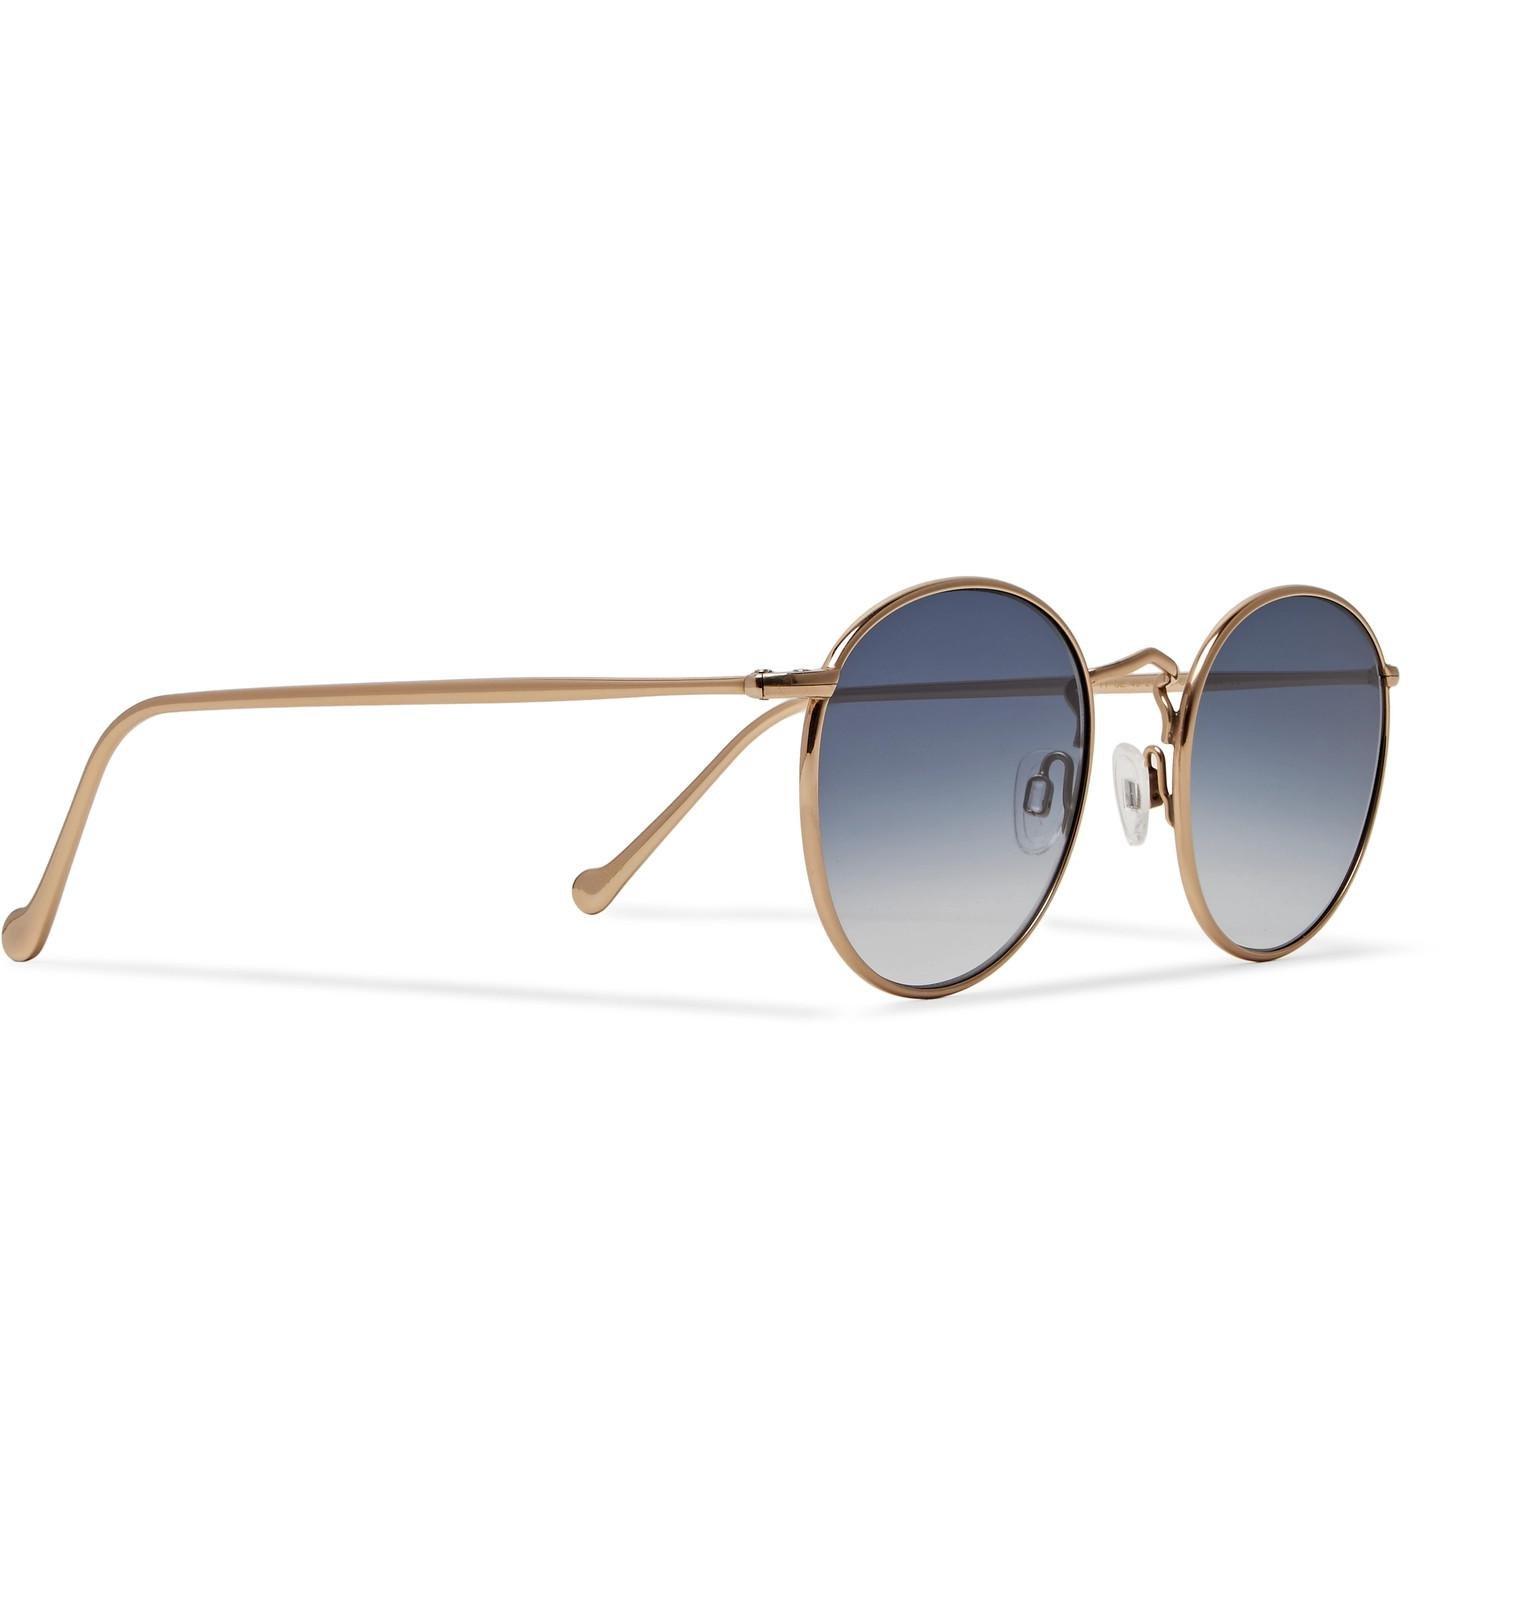 b6899f286db Moscot - Metallic Zev Round-frame Gold-tone Titanium Sunglasses for Men -  Lyst. View fullscreen